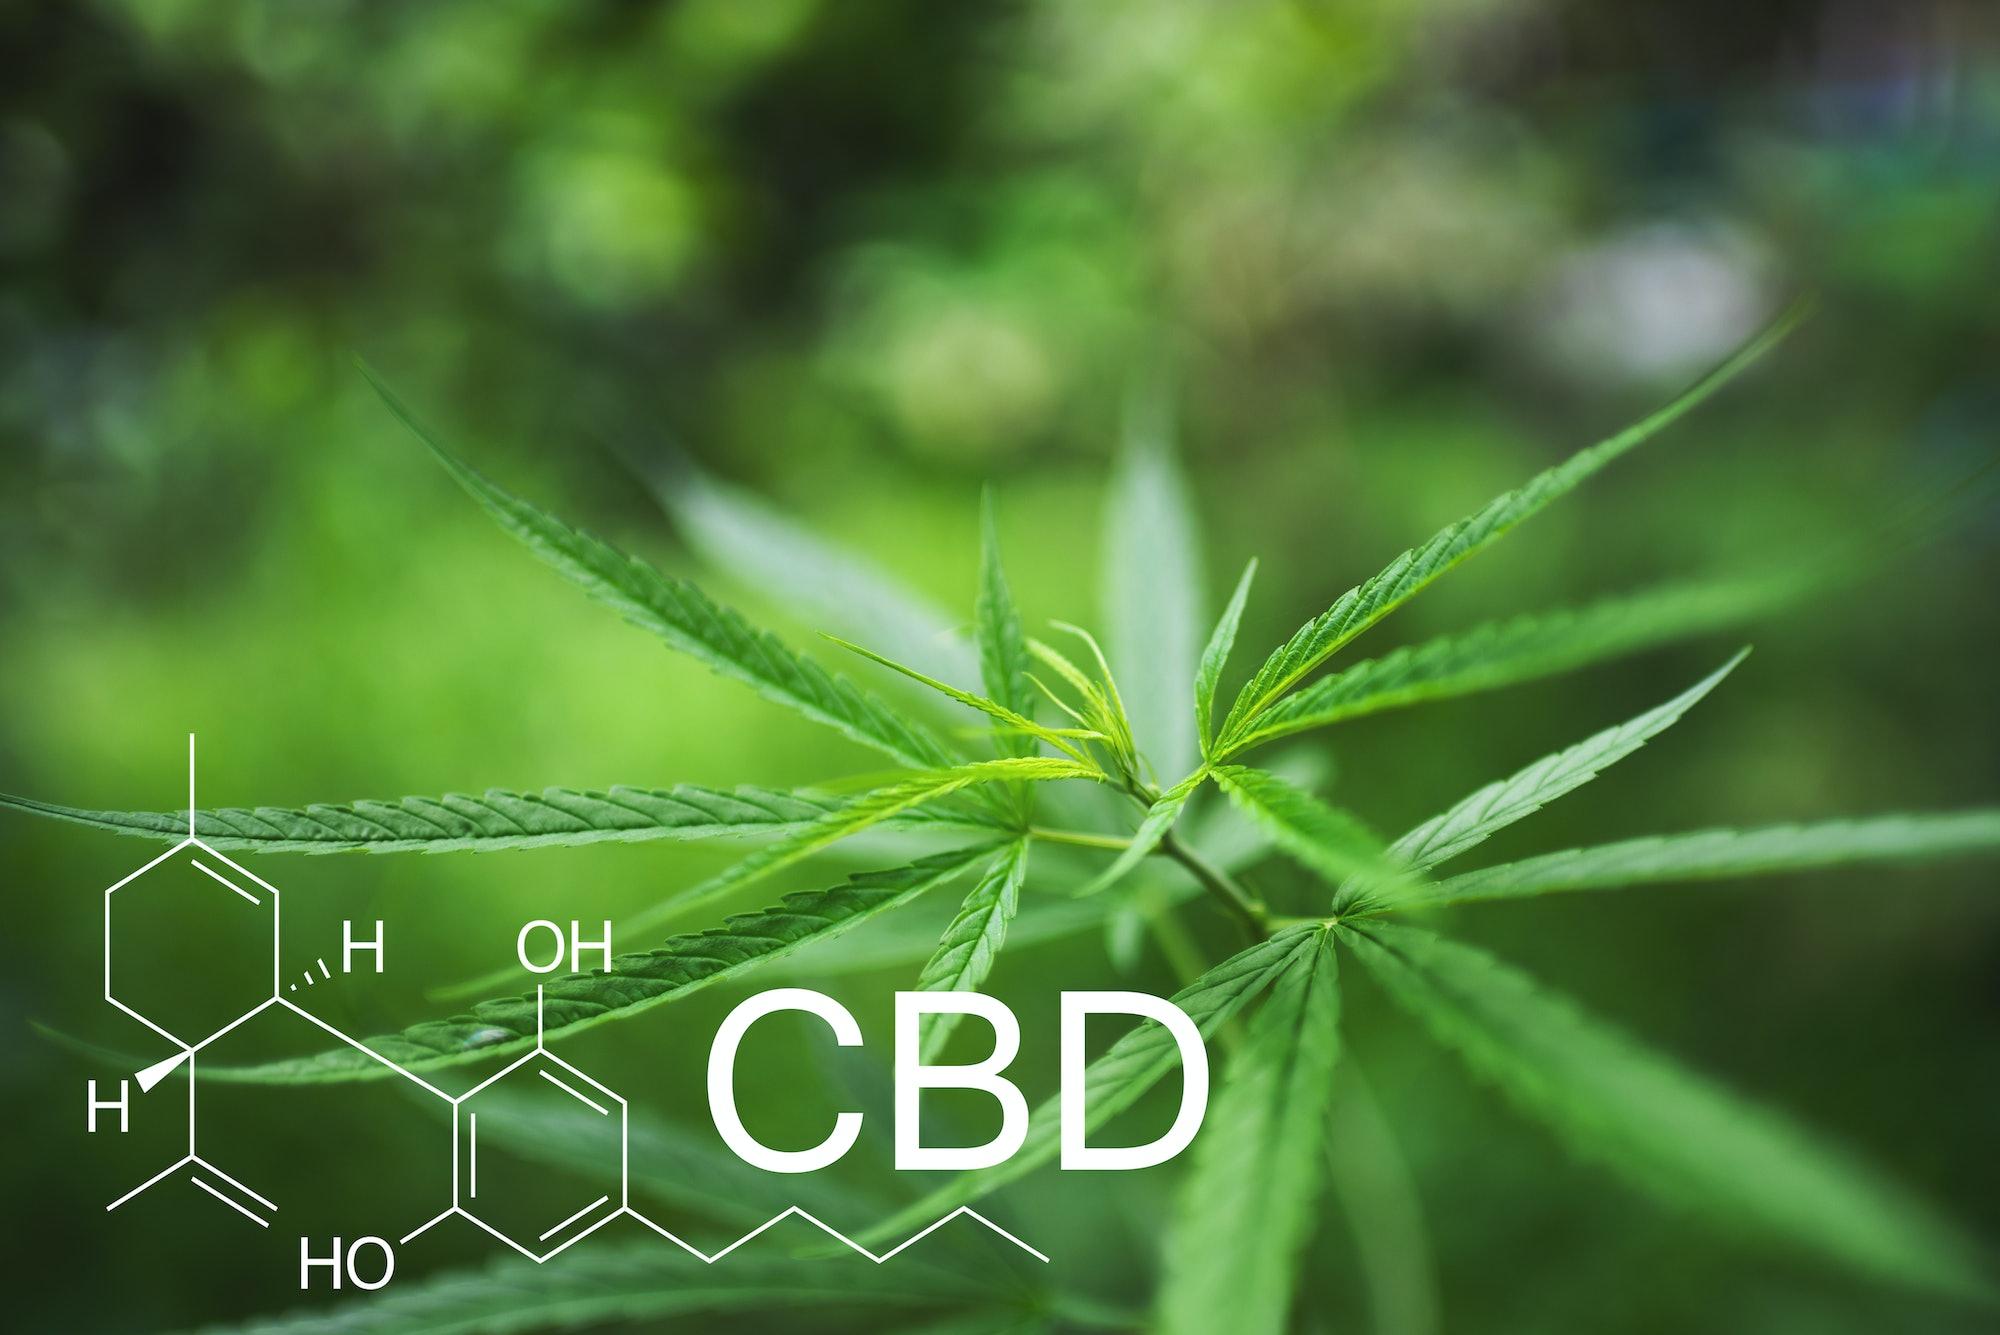 Cannabidiol chemical structure on green cannabis leaf background